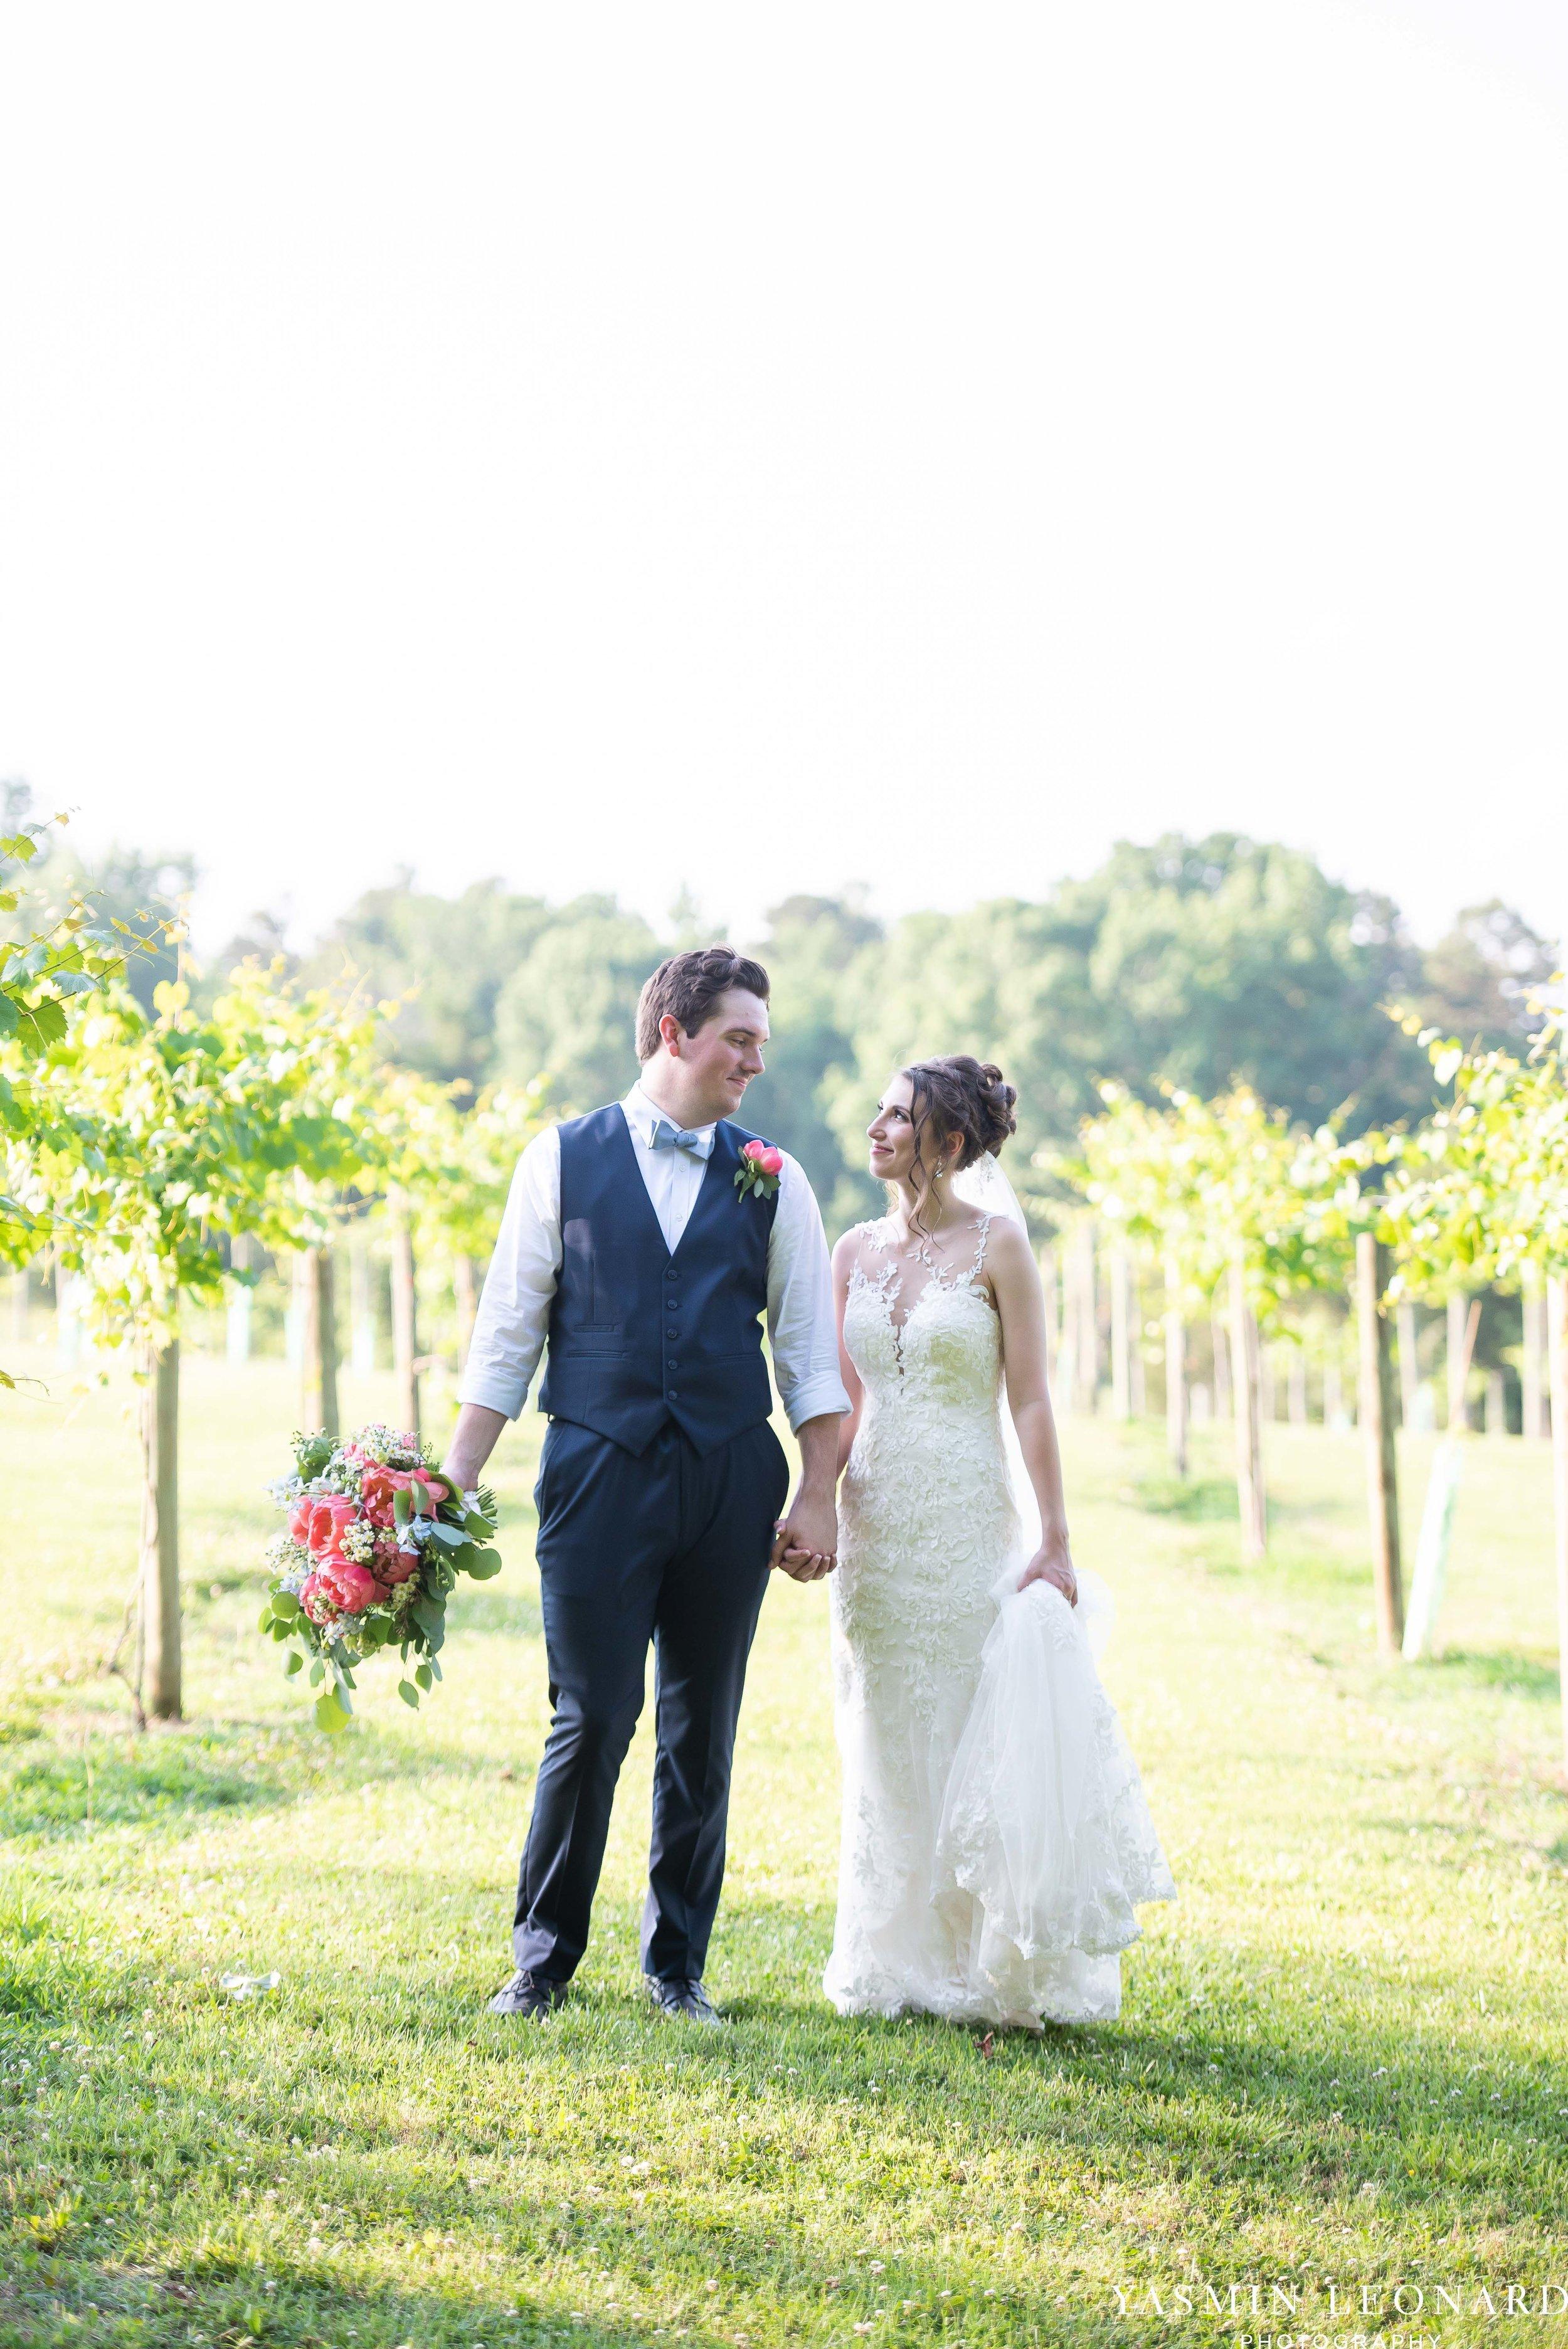 Old Homeplace Vineyard - NC Weddings - Outdoor Summer Weddings - Peony Boutique - Vineyard Wedding - NC Photographer - Yasmin Leonard Photography-45.jpg